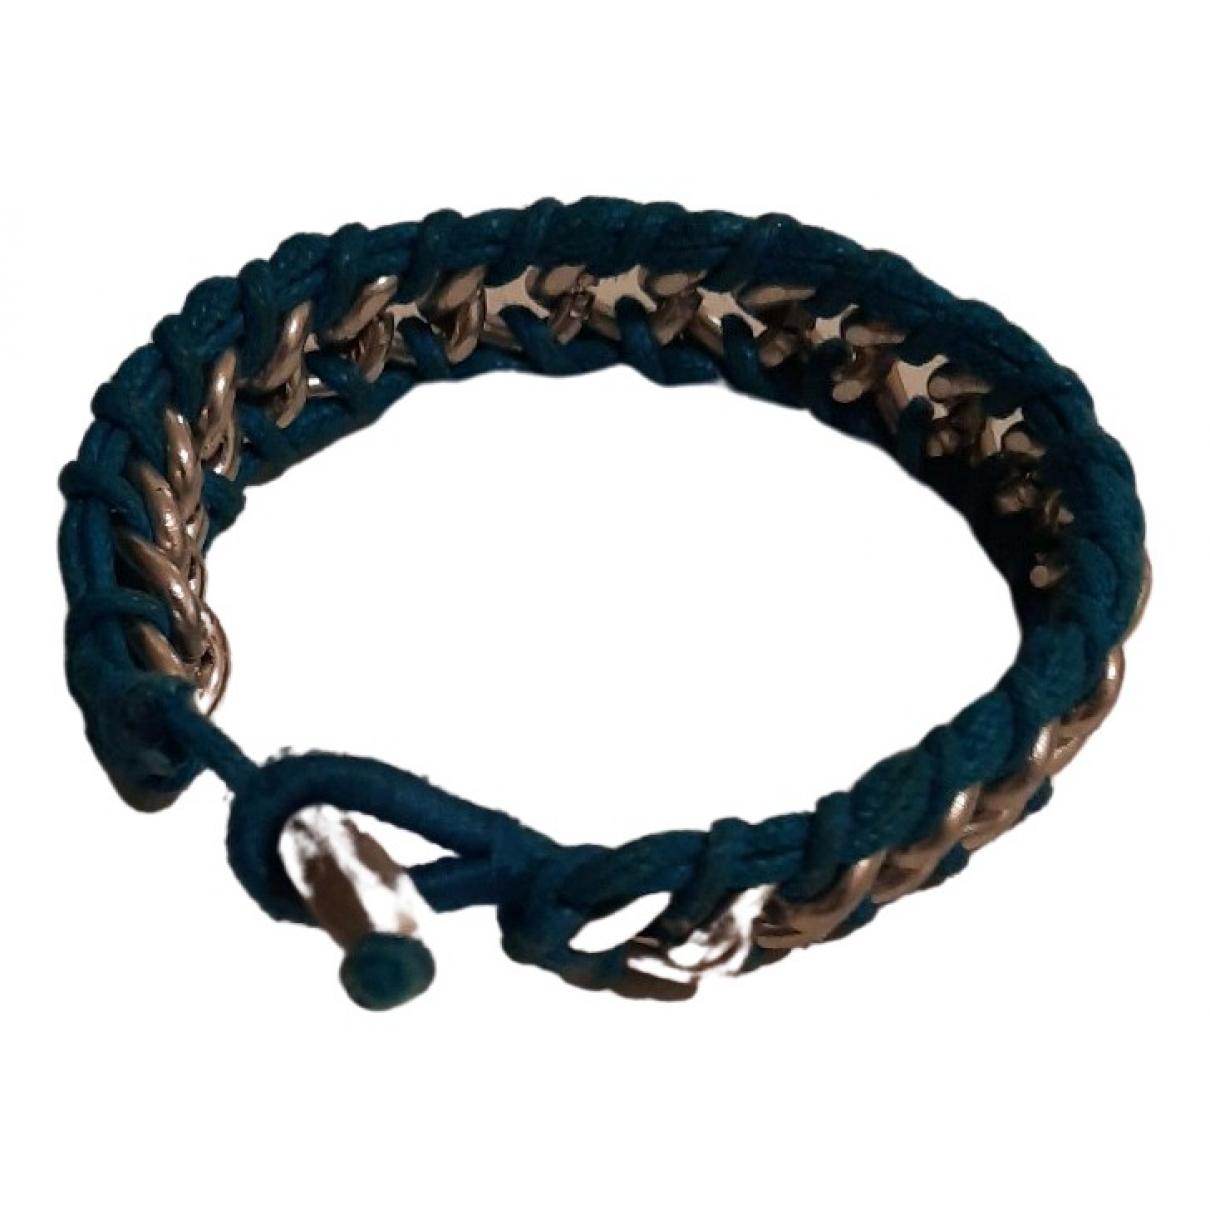 Diesel - Bracelet   pour femme en metal - bleu